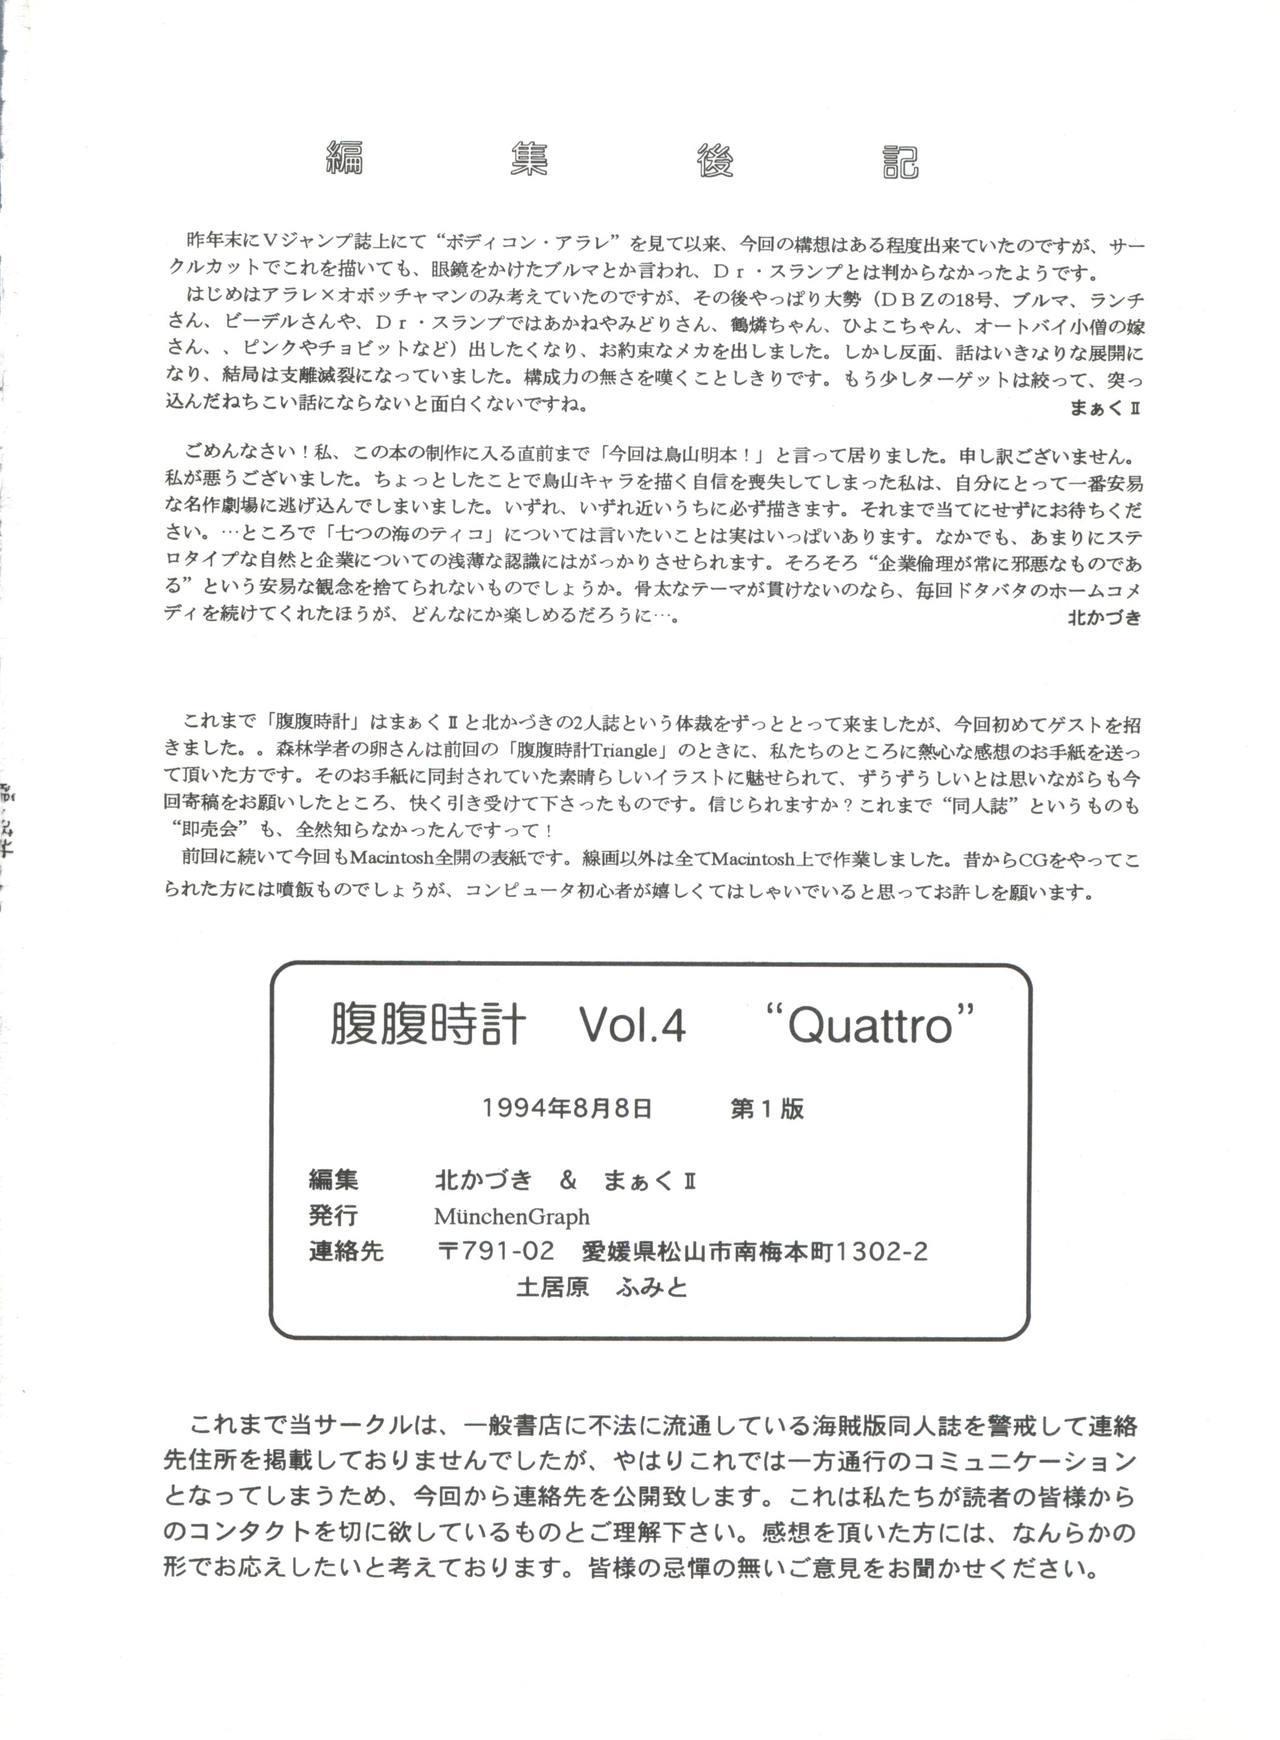 Hara Hara Dokei Vol. 4 Quattro 88